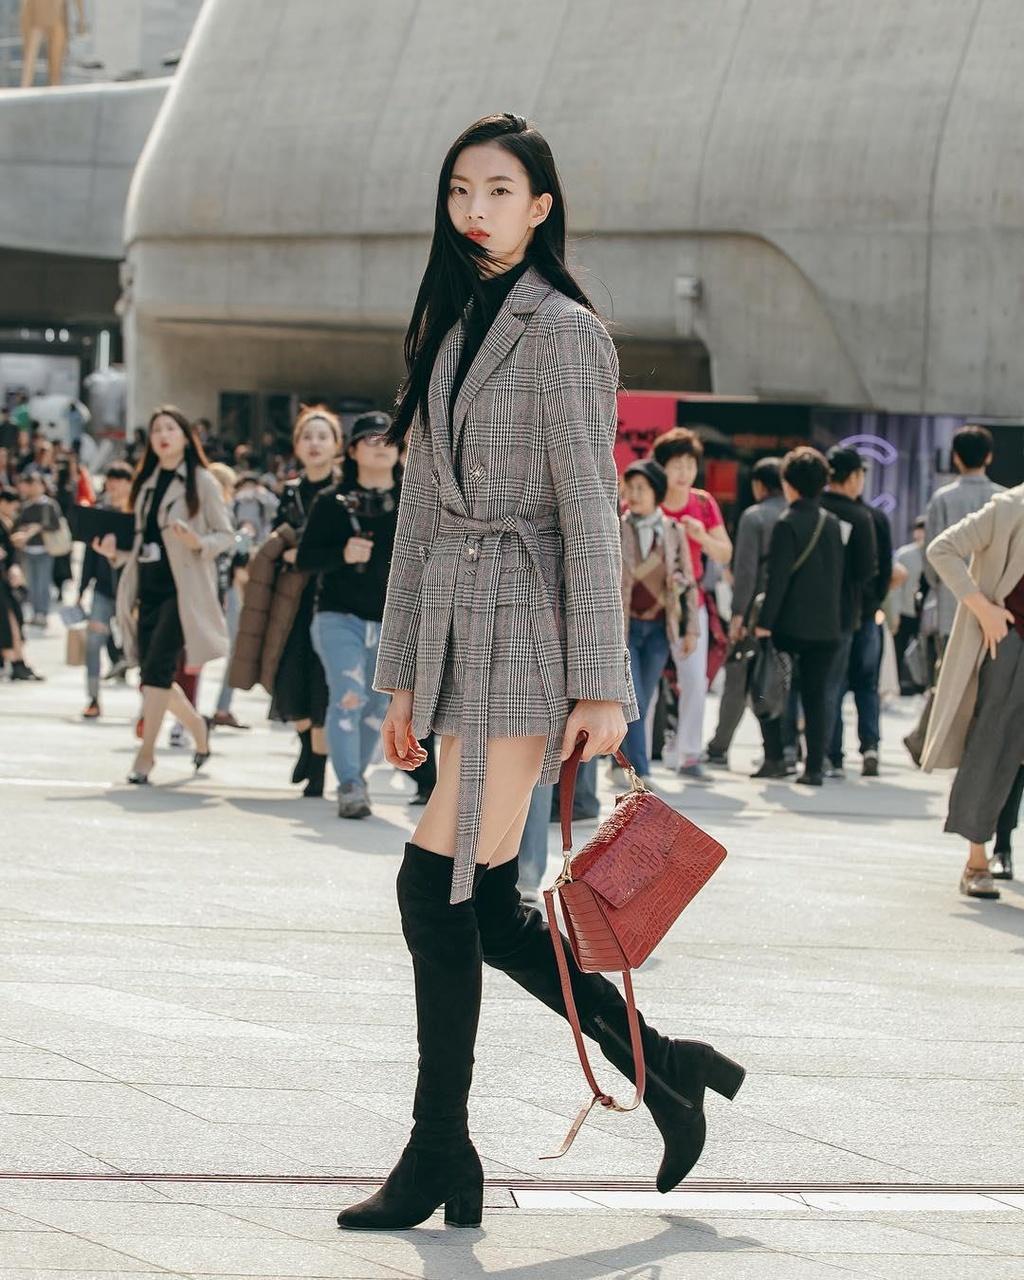 Hinh anh A quan The Face tai Seoul Fashion Week len Vogue hinh anh 18